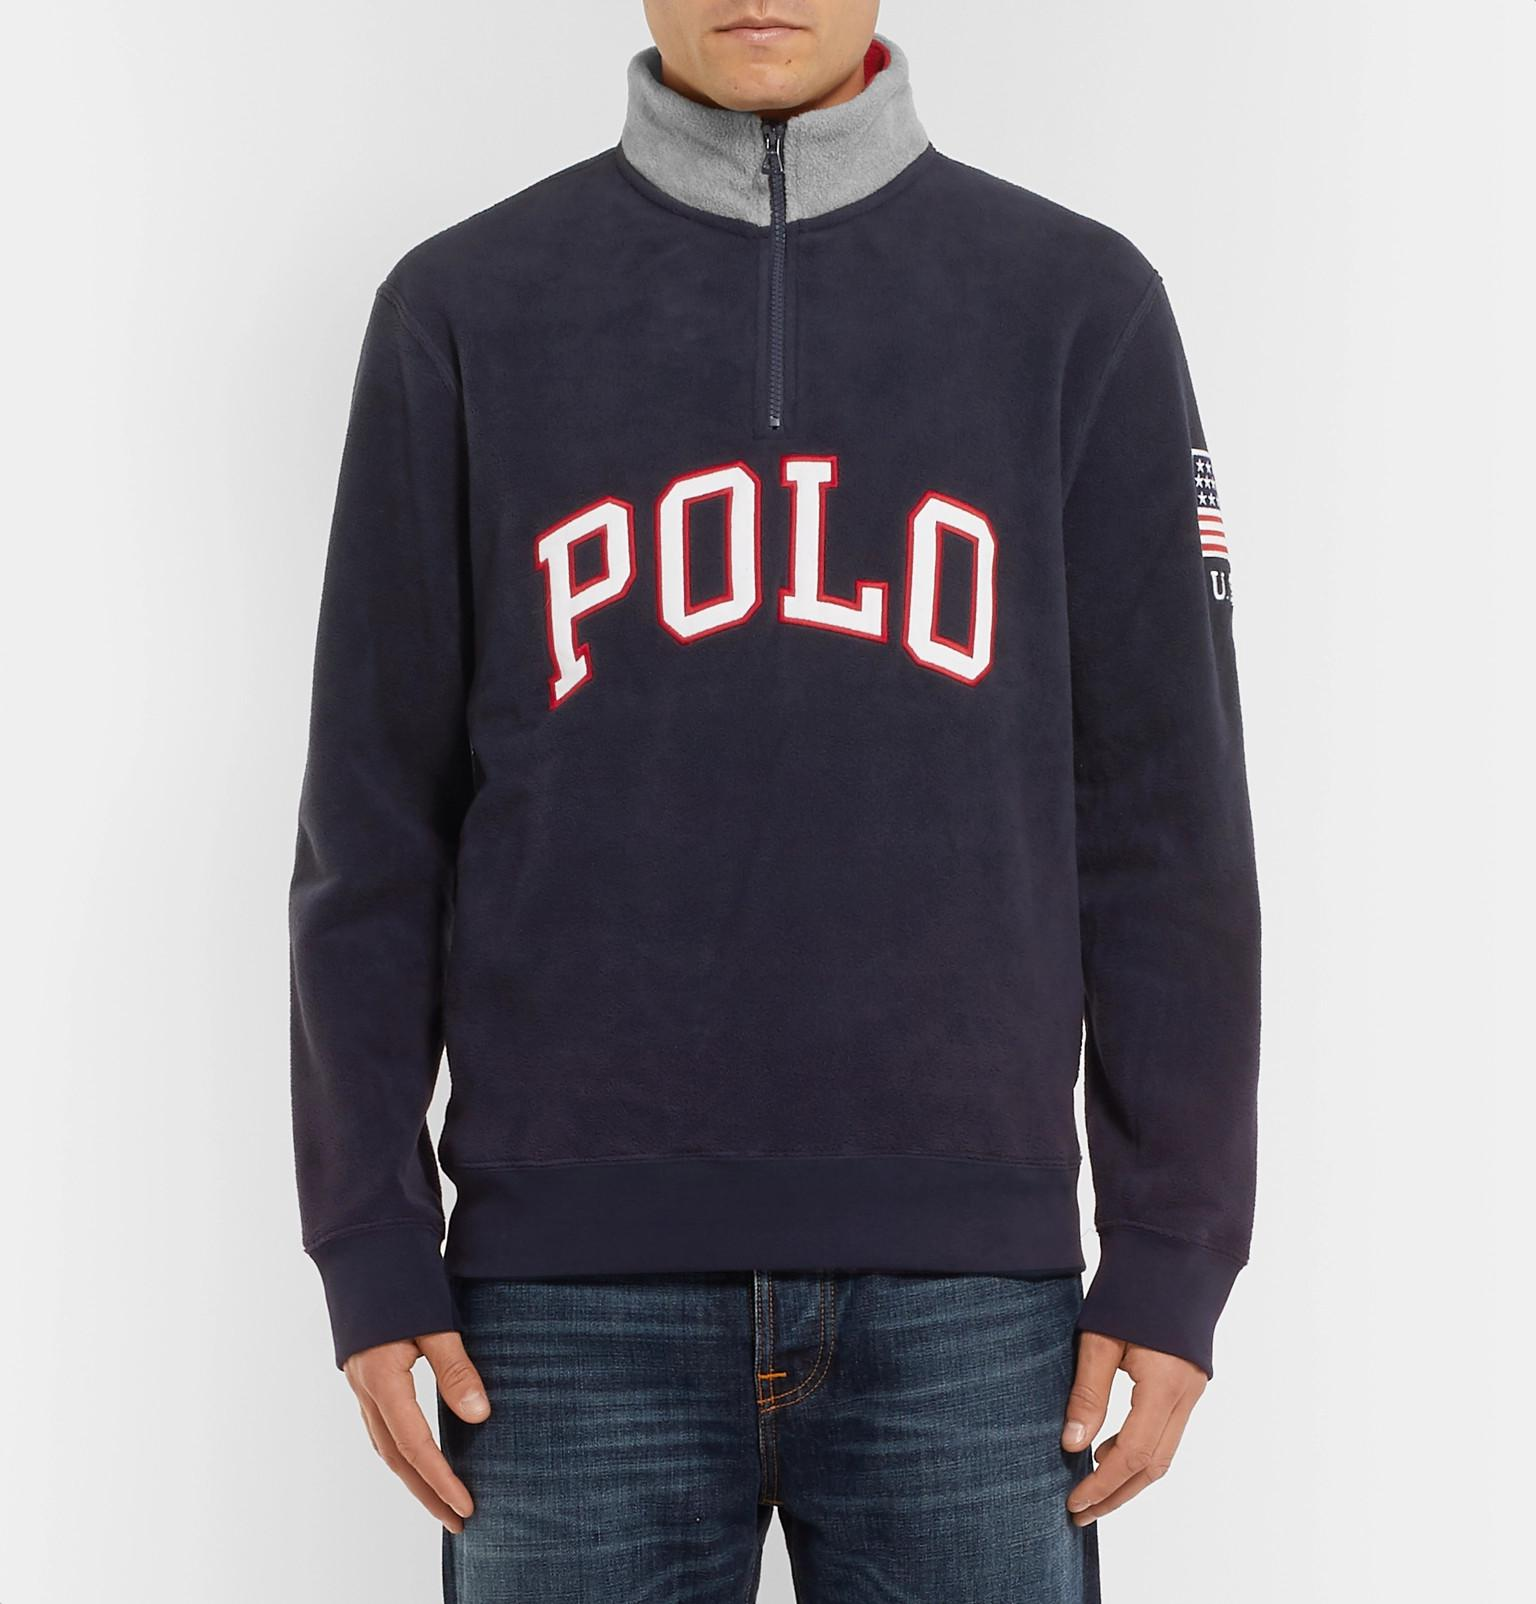 Polo Ralph Lauren - Blue Logo-appliquéd Fleece Half-zip Sweatshirt for Men  -. View fullscreen 06f8e3f1e88